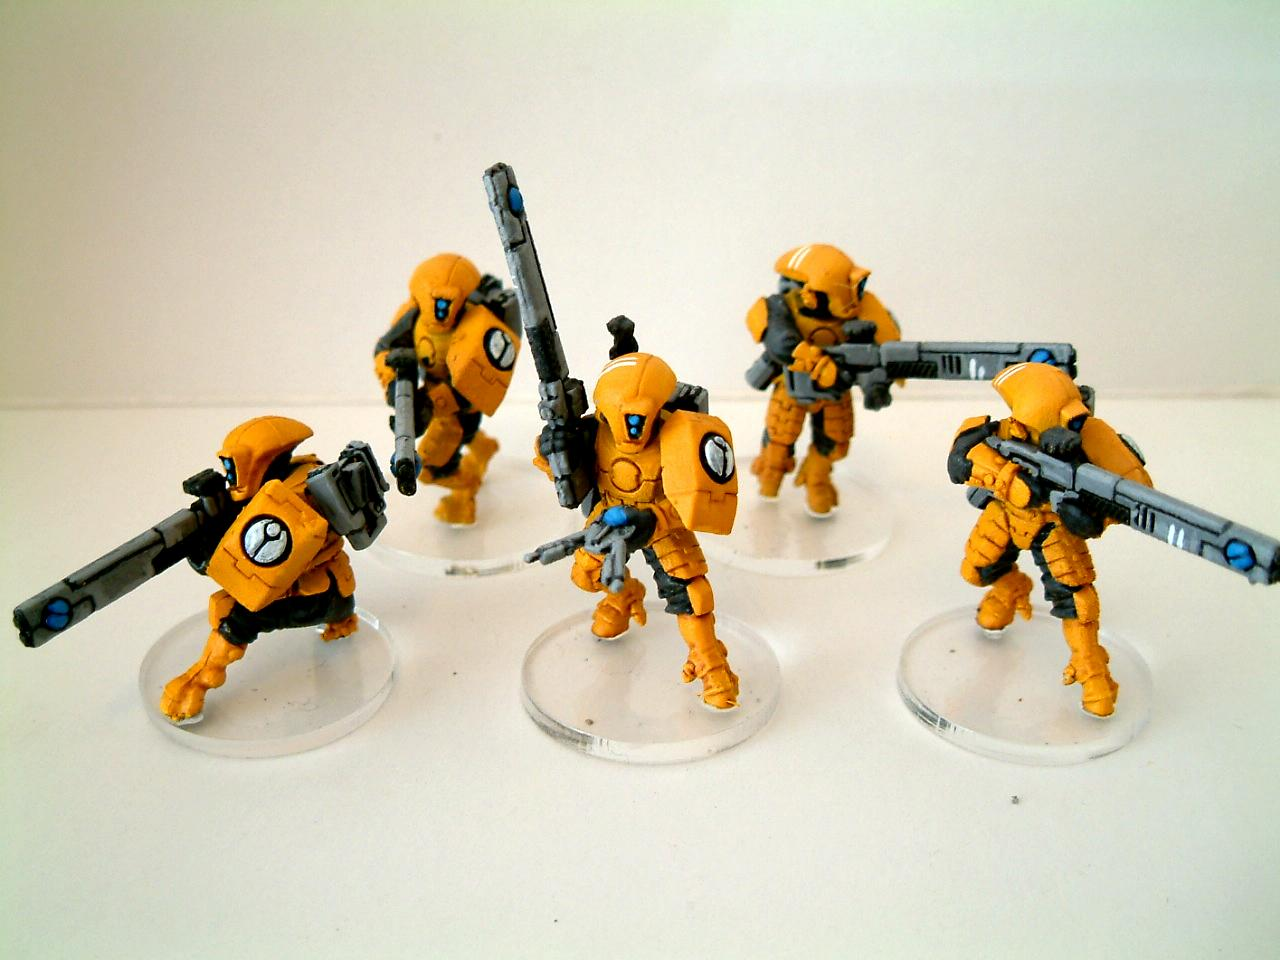 Acrylic, Bright, Clear Base, Fire Warriors, Tau, Warhammer 40,000, Yellow